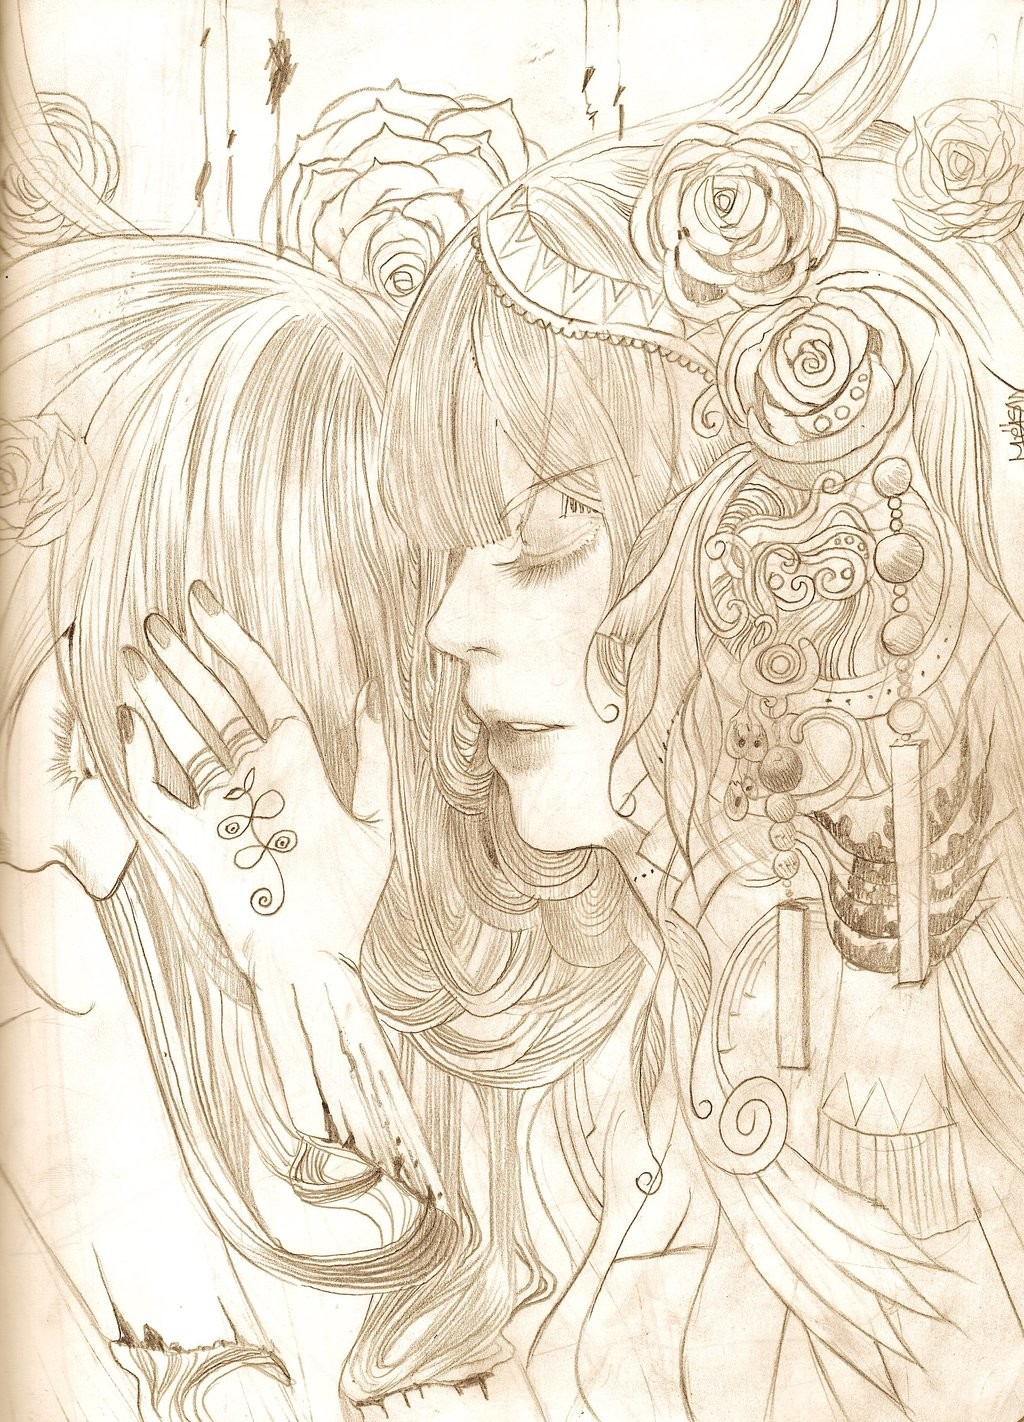 Sasi tanadeerojkul sacred pencil ver by meisan dbllbd2 2